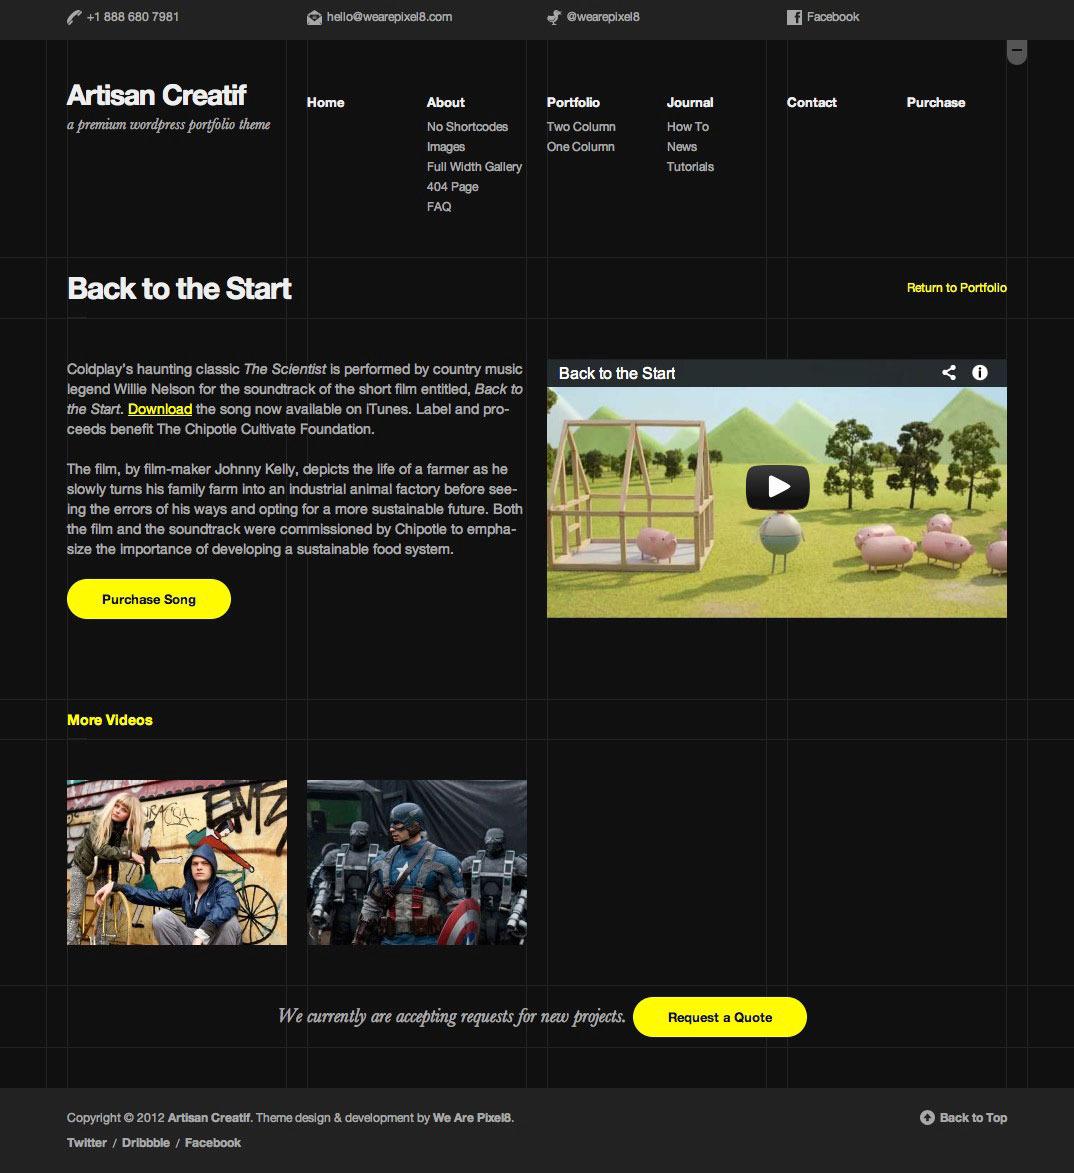 Artisan Creatif portfolio dark